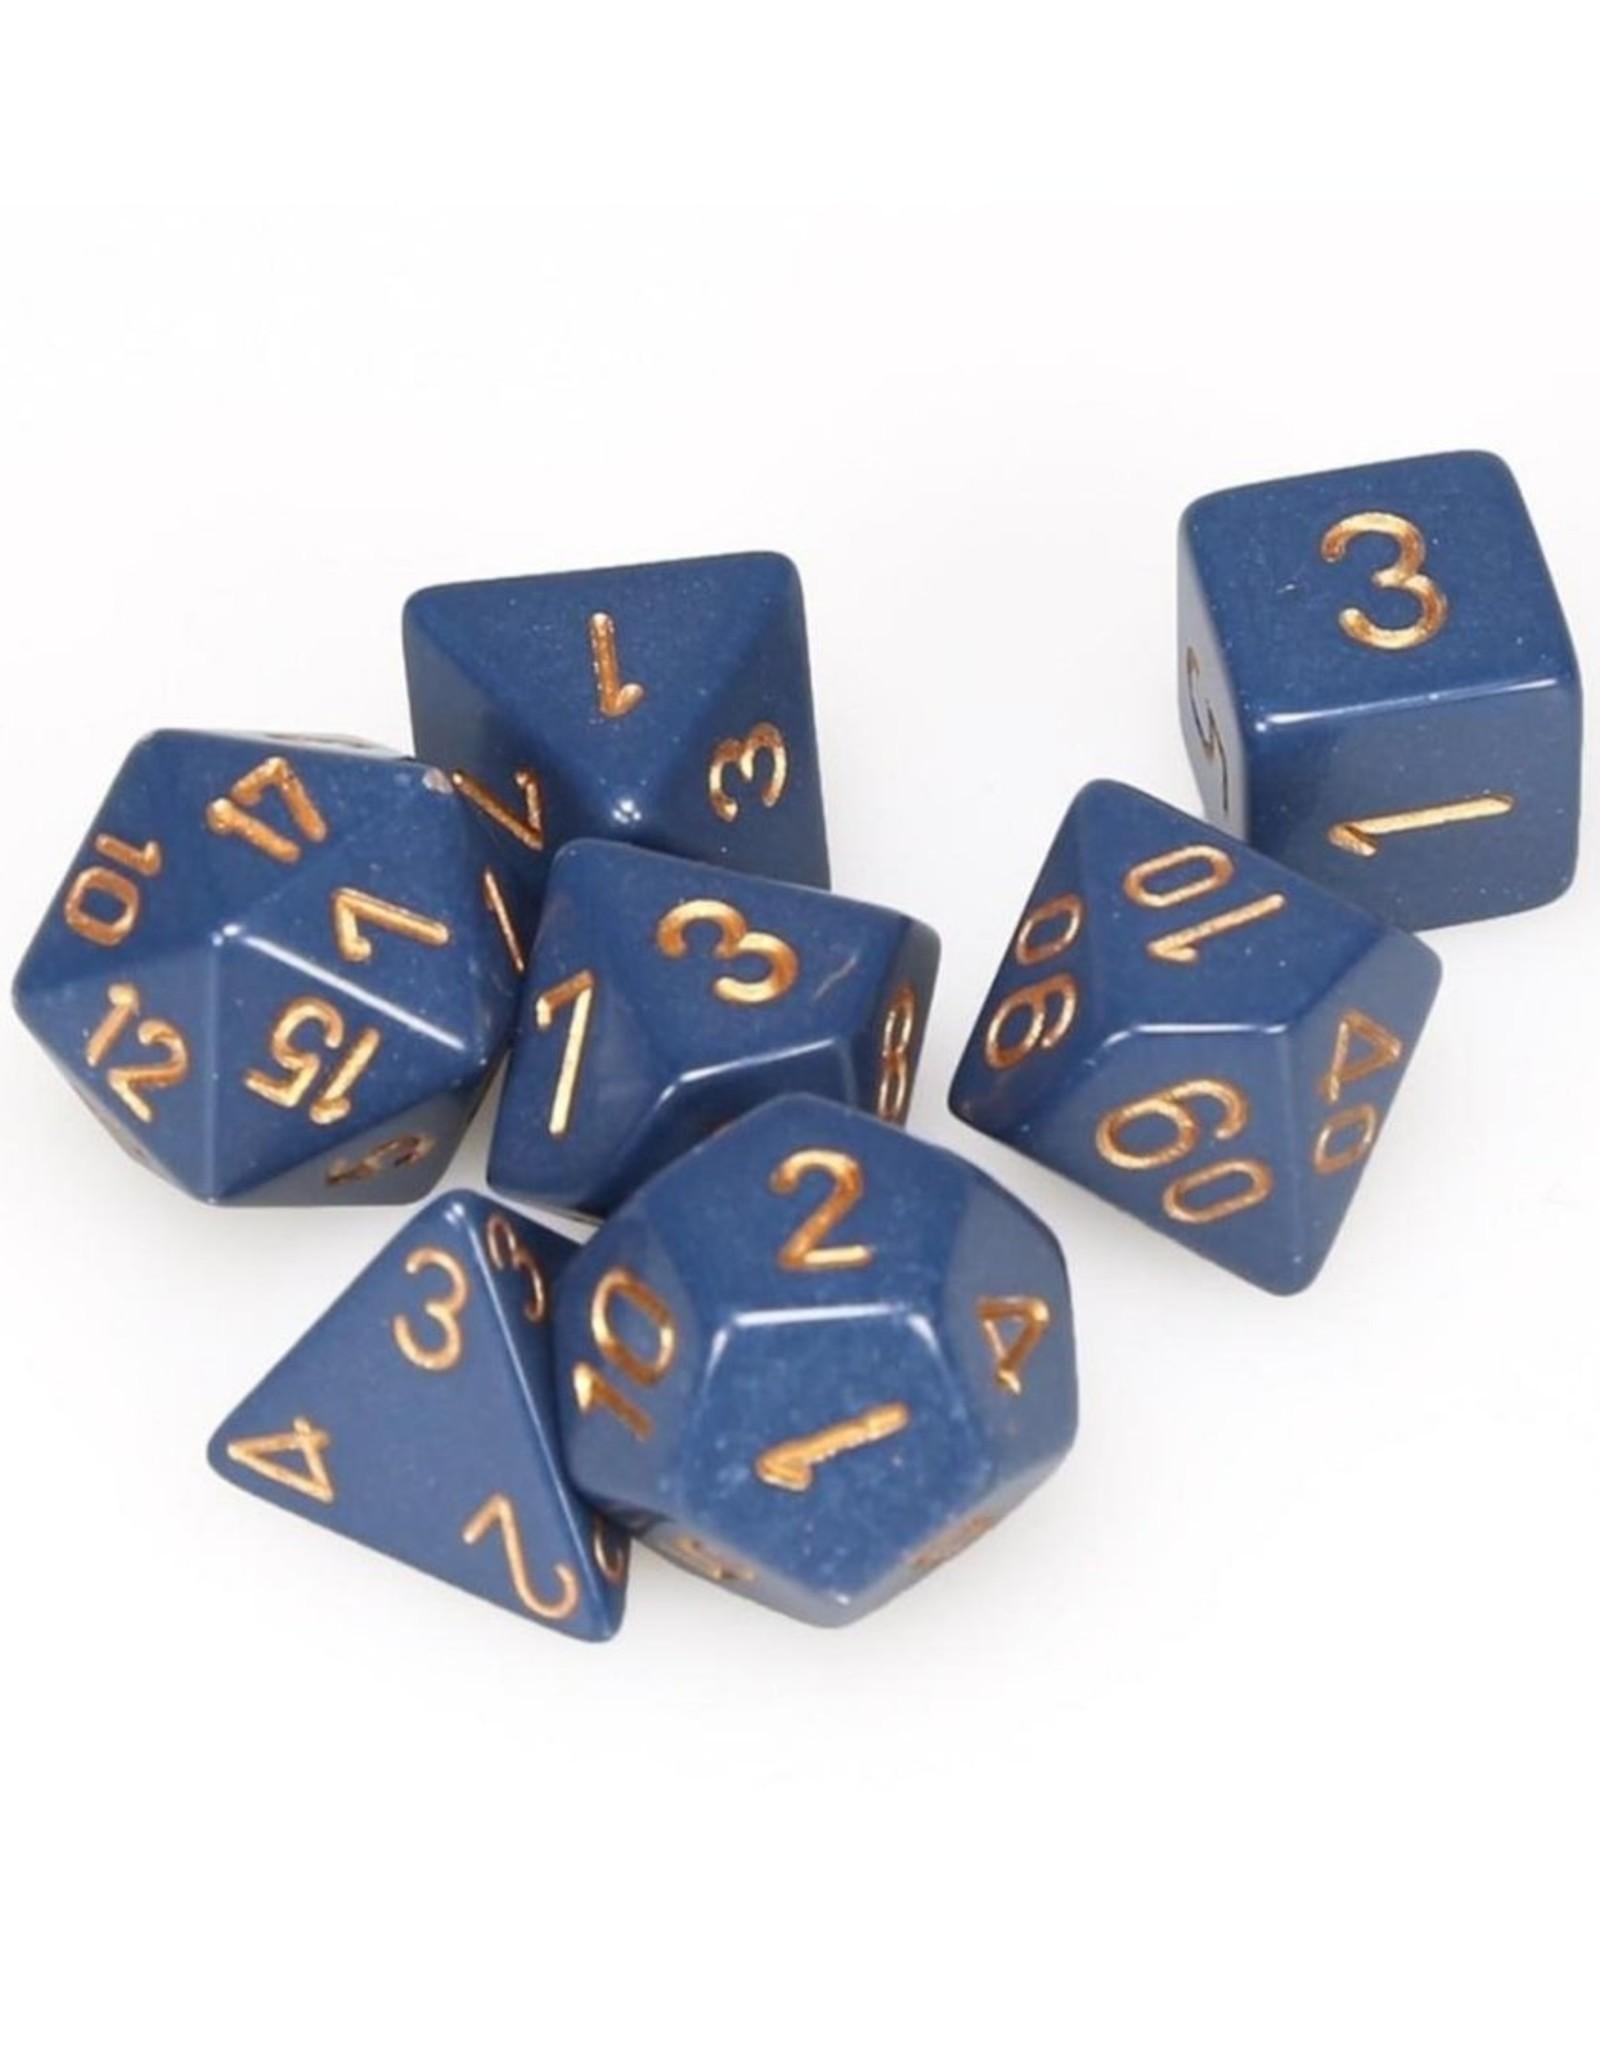 Chessex Chessex 7-Die set Opaque - Dusty Blue/Copper